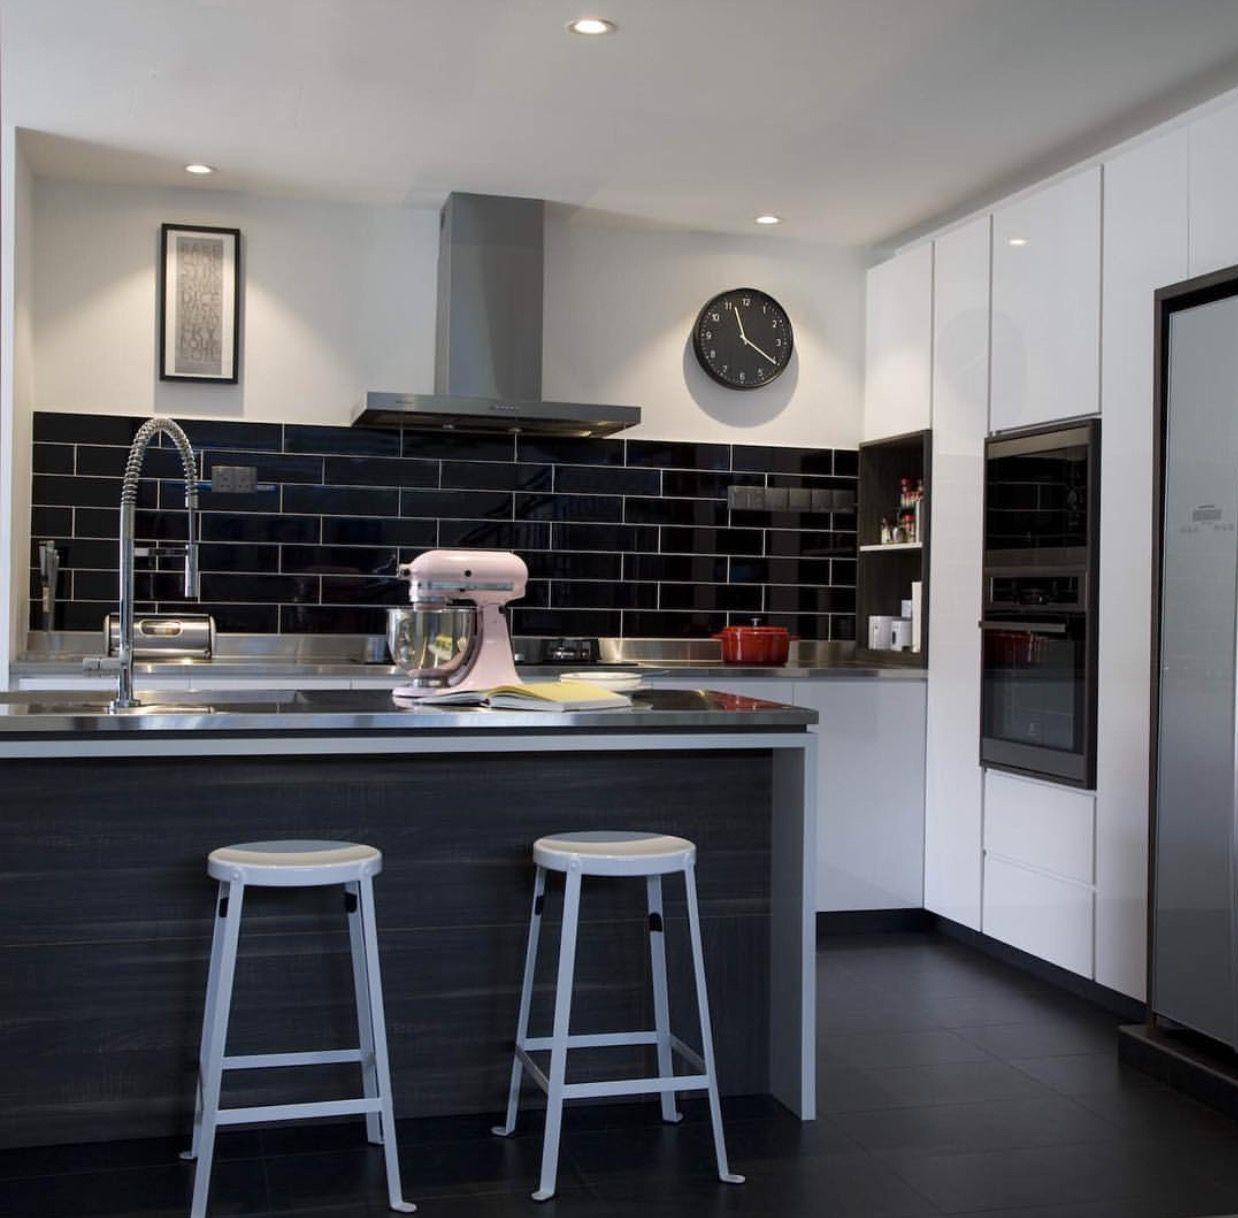 Home Design Ideas For Hdb Flats: Pin By Laney On HDB BTO Scandinavian